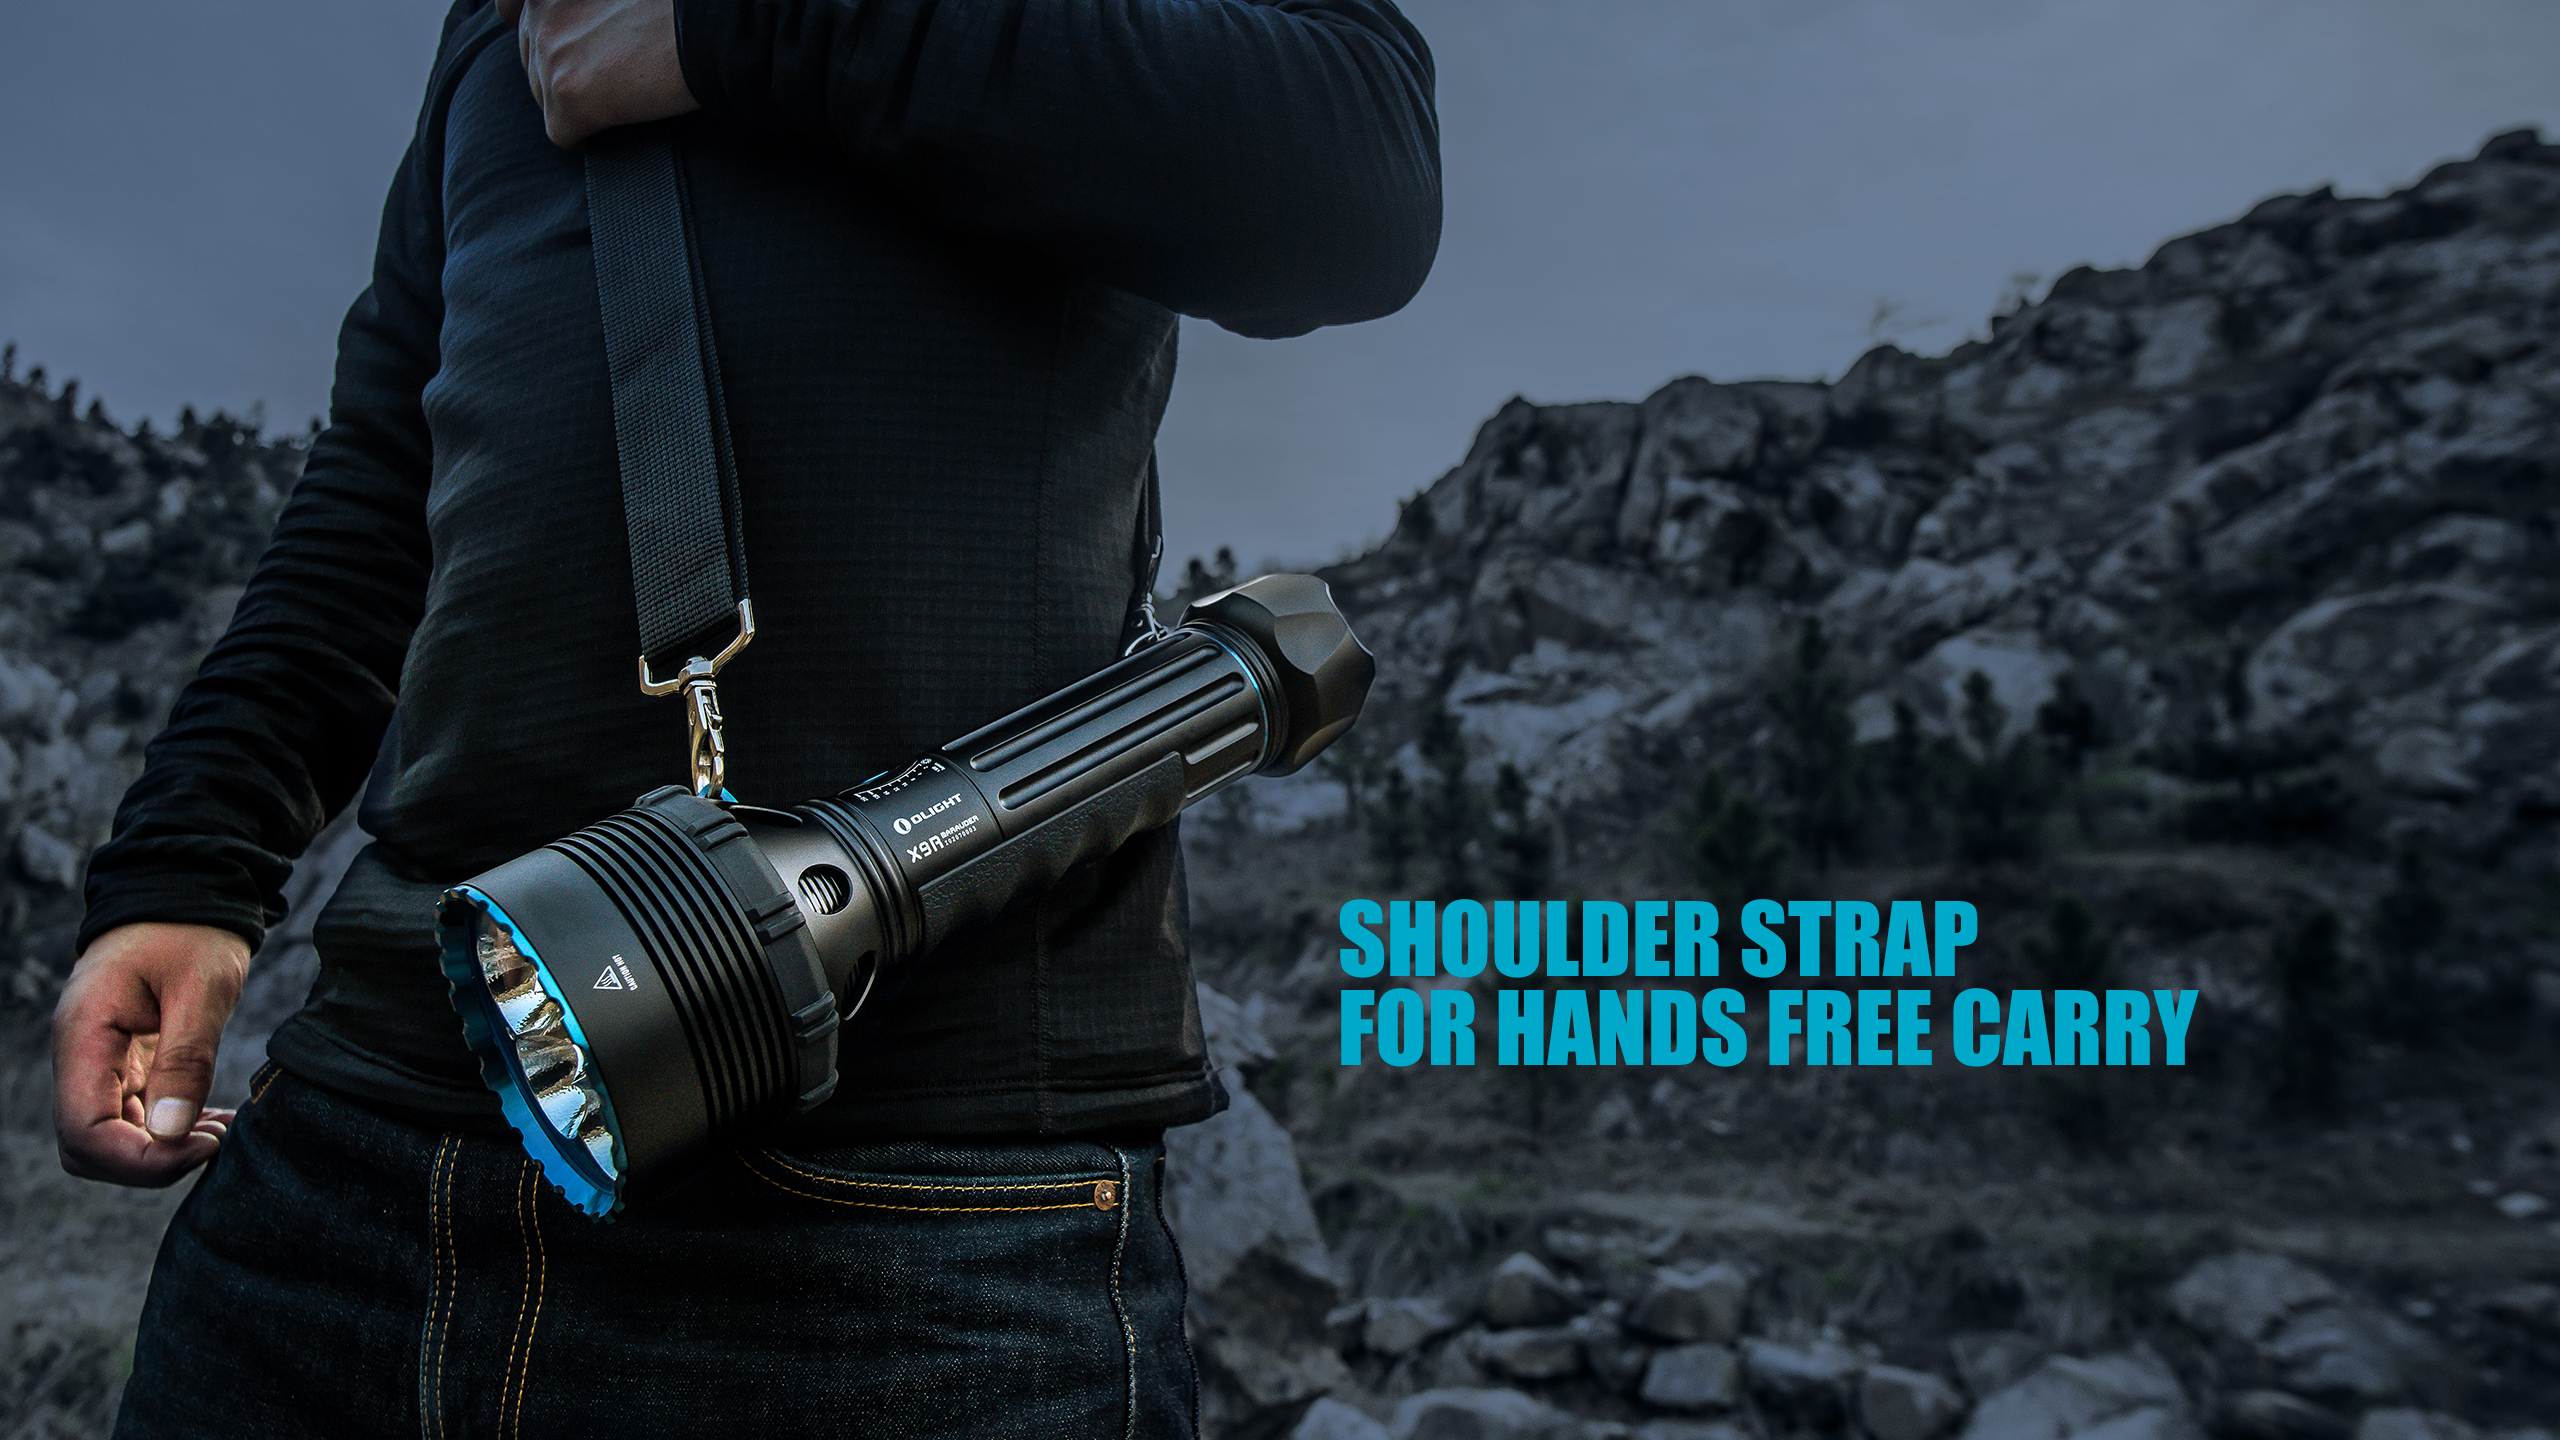 X9R Brightest Flashlight Shoulder Strap